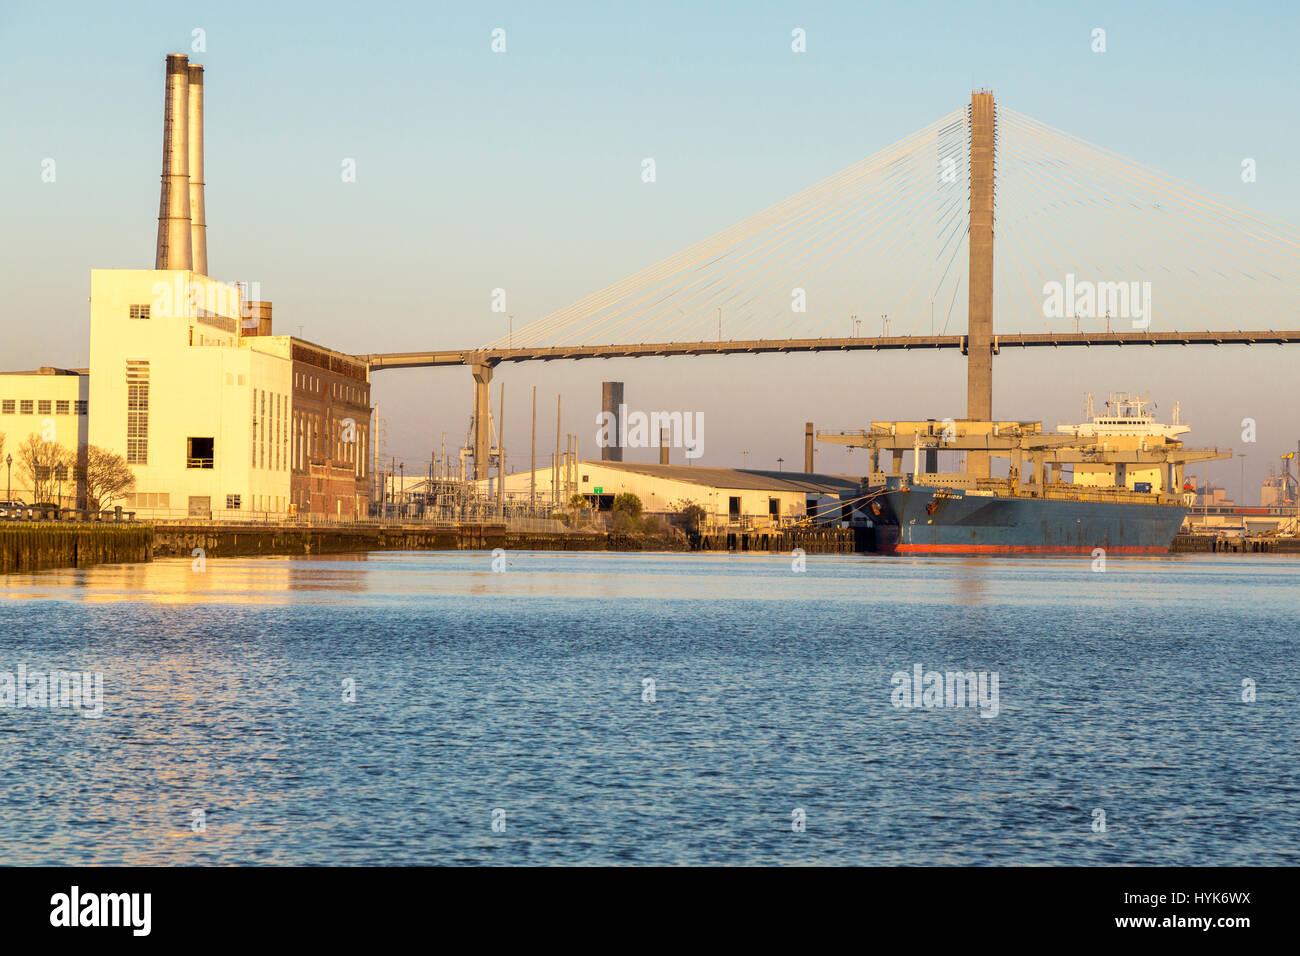 Savannah, Georgia.  Cargo Ship in Savannah River, Talmadge Bridge in Background. - Stock Image